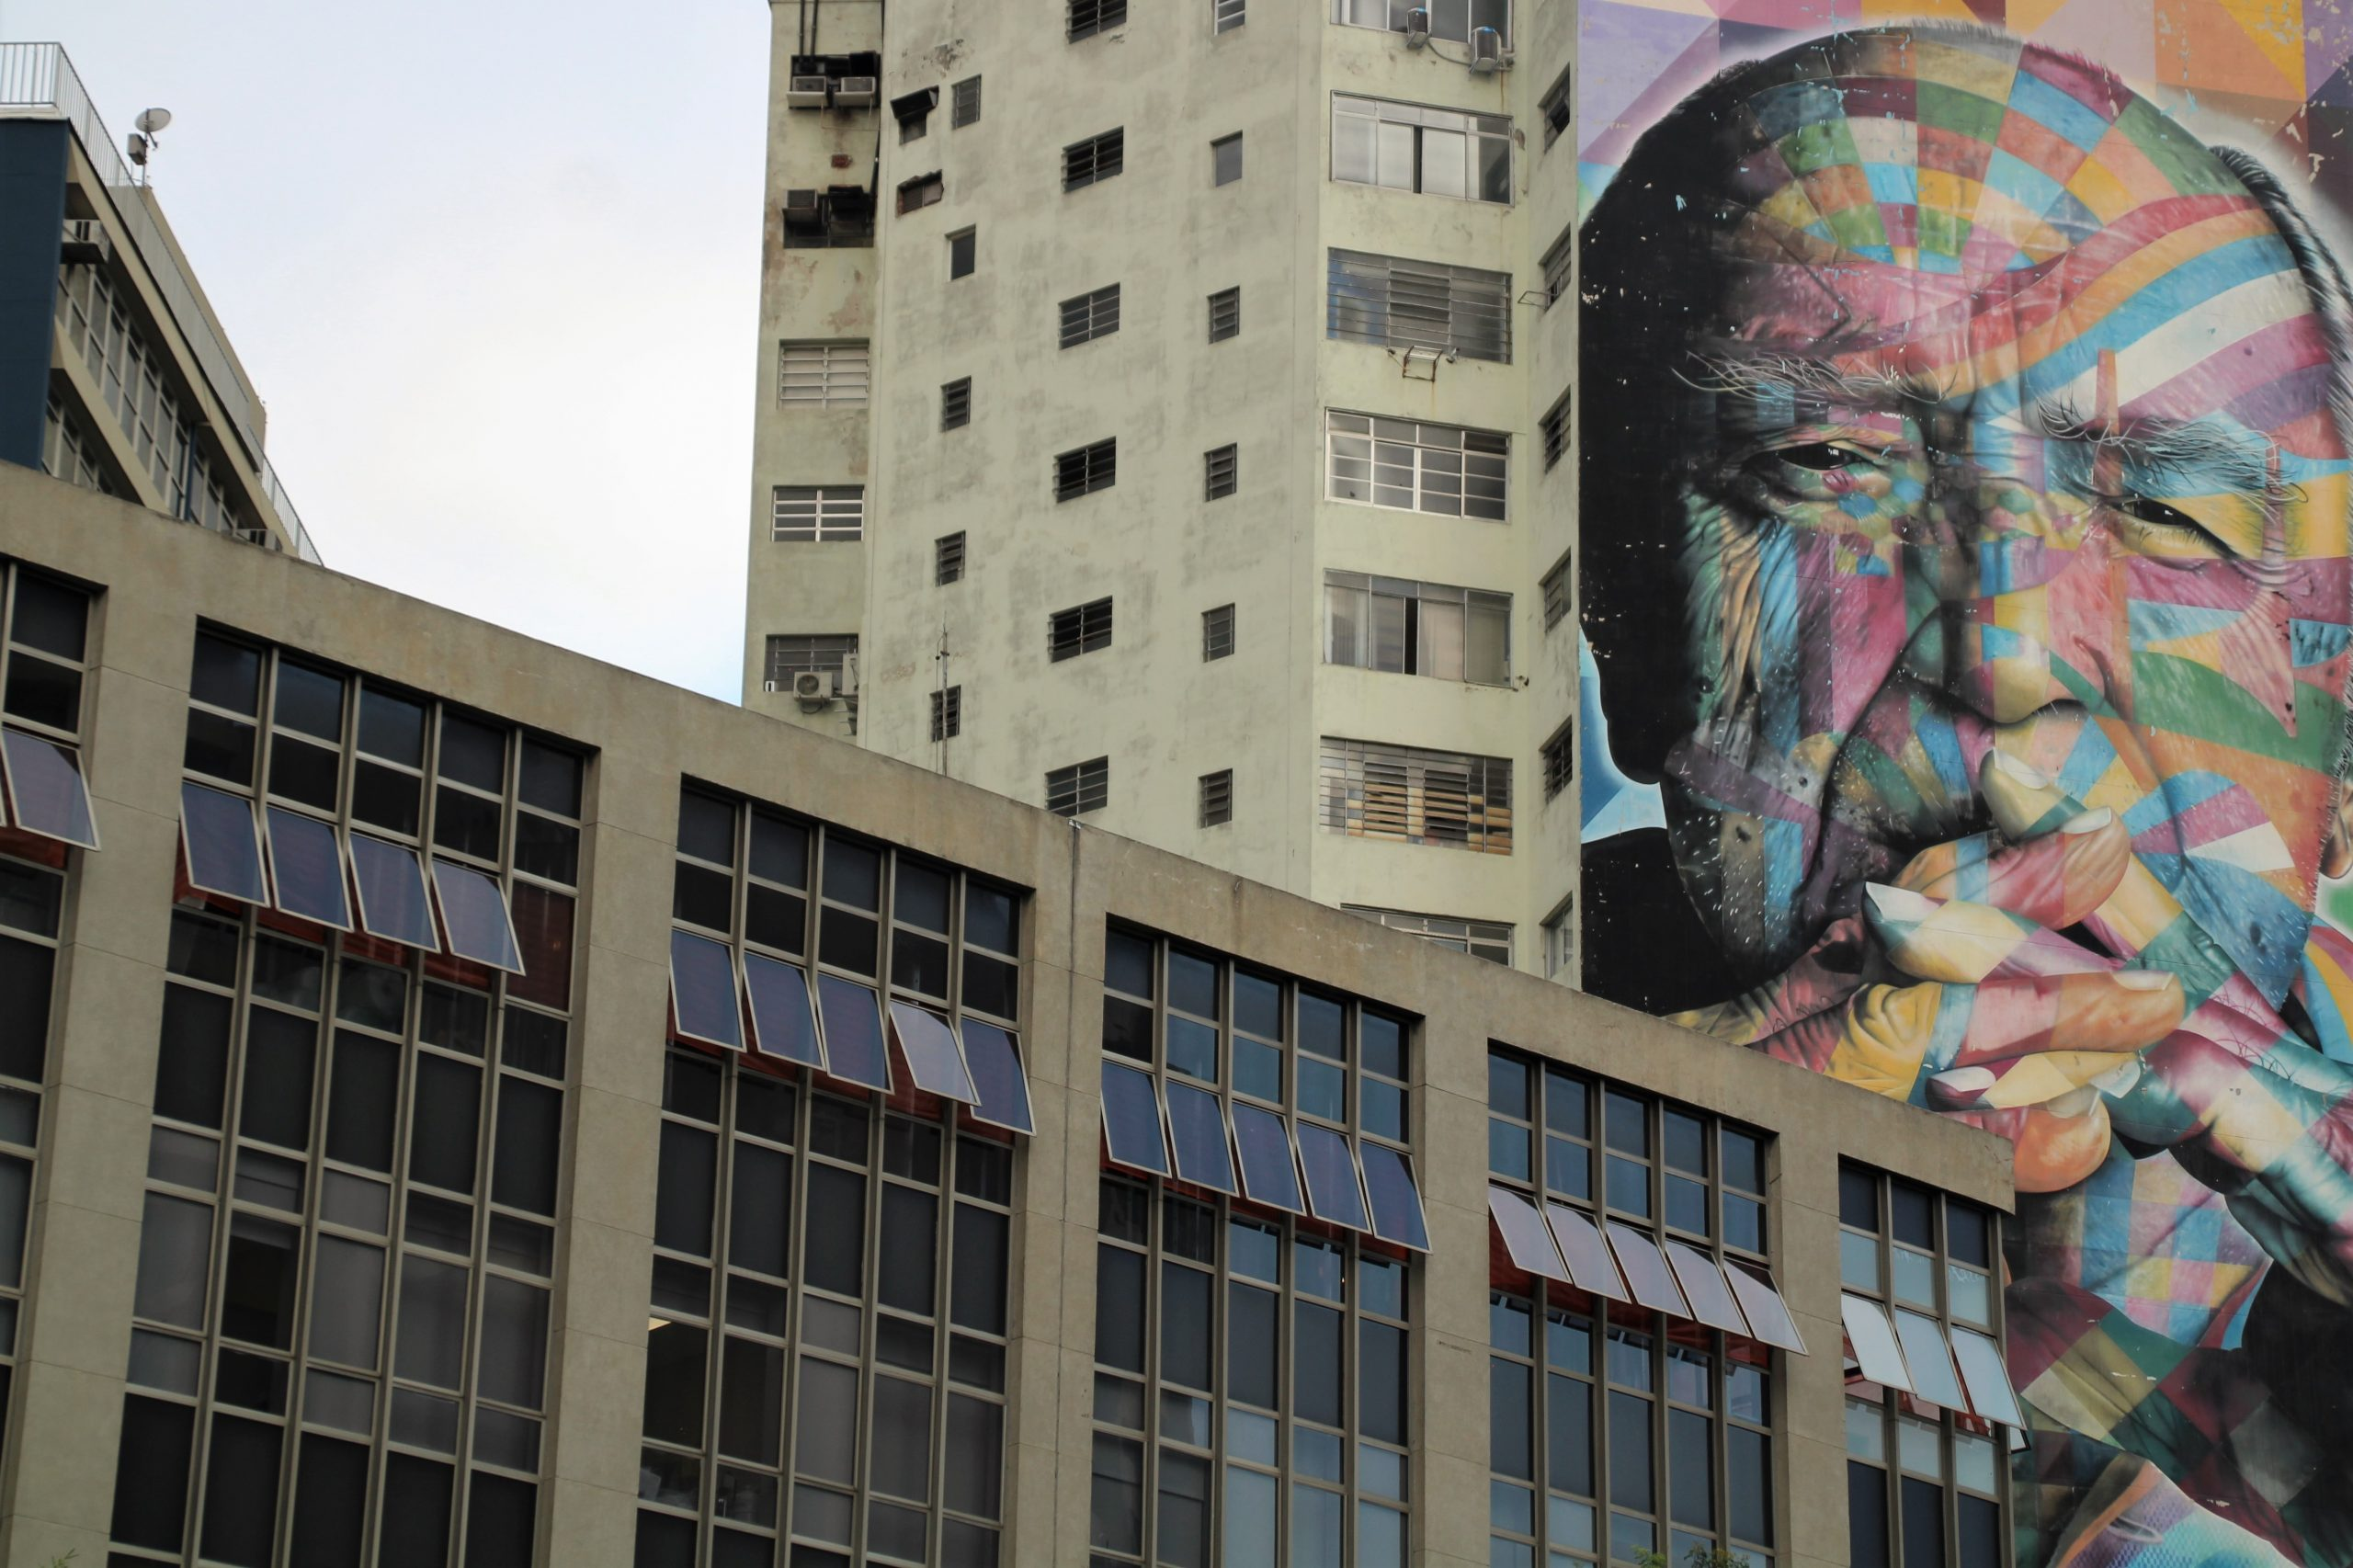 San Paolo, Brasile: cosa vedere